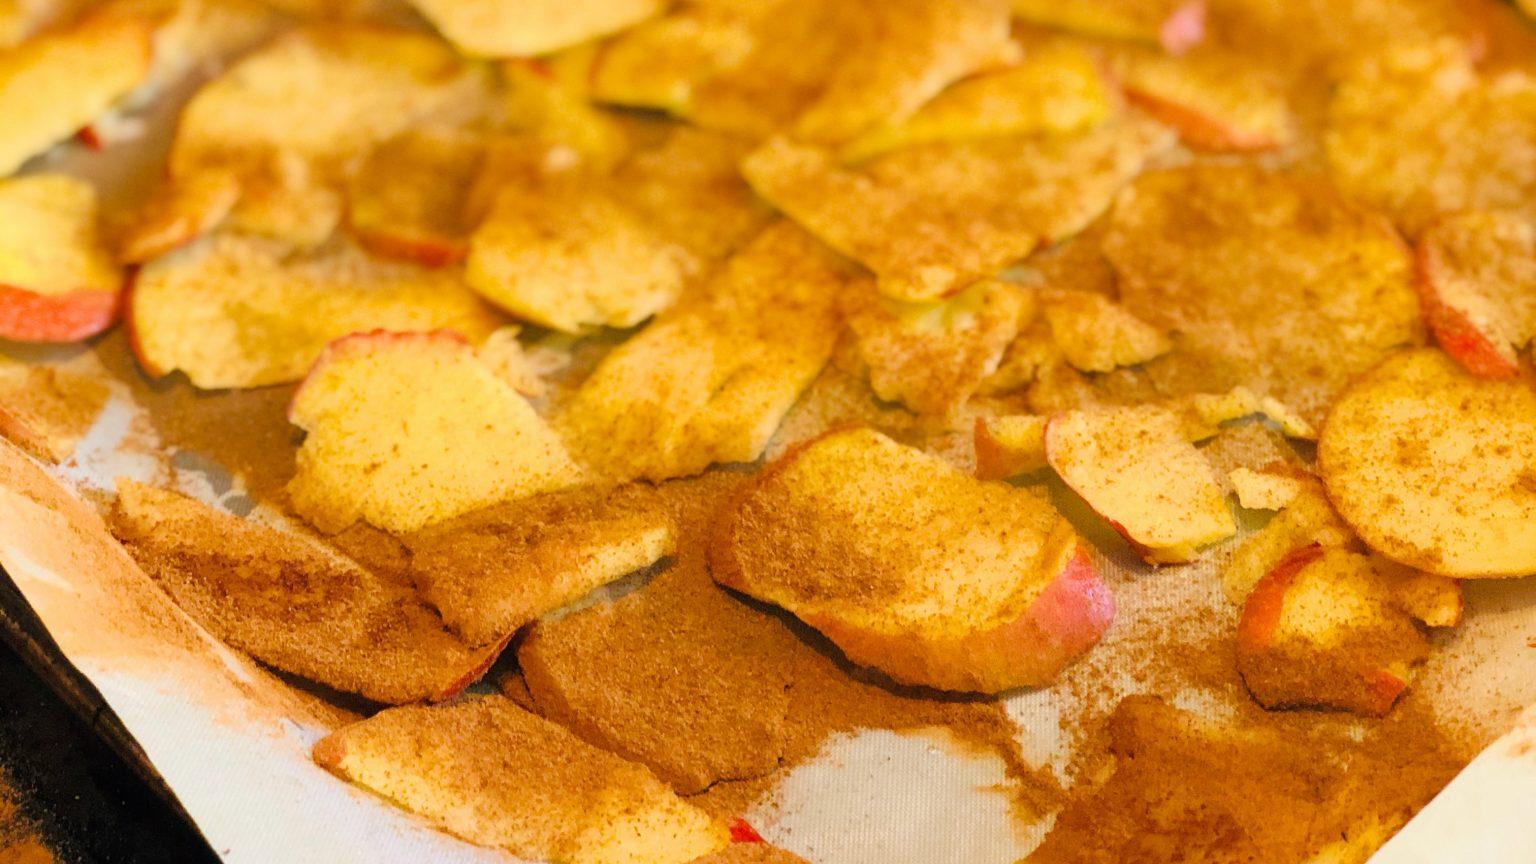 Recept Gezond Snack Appel Chips